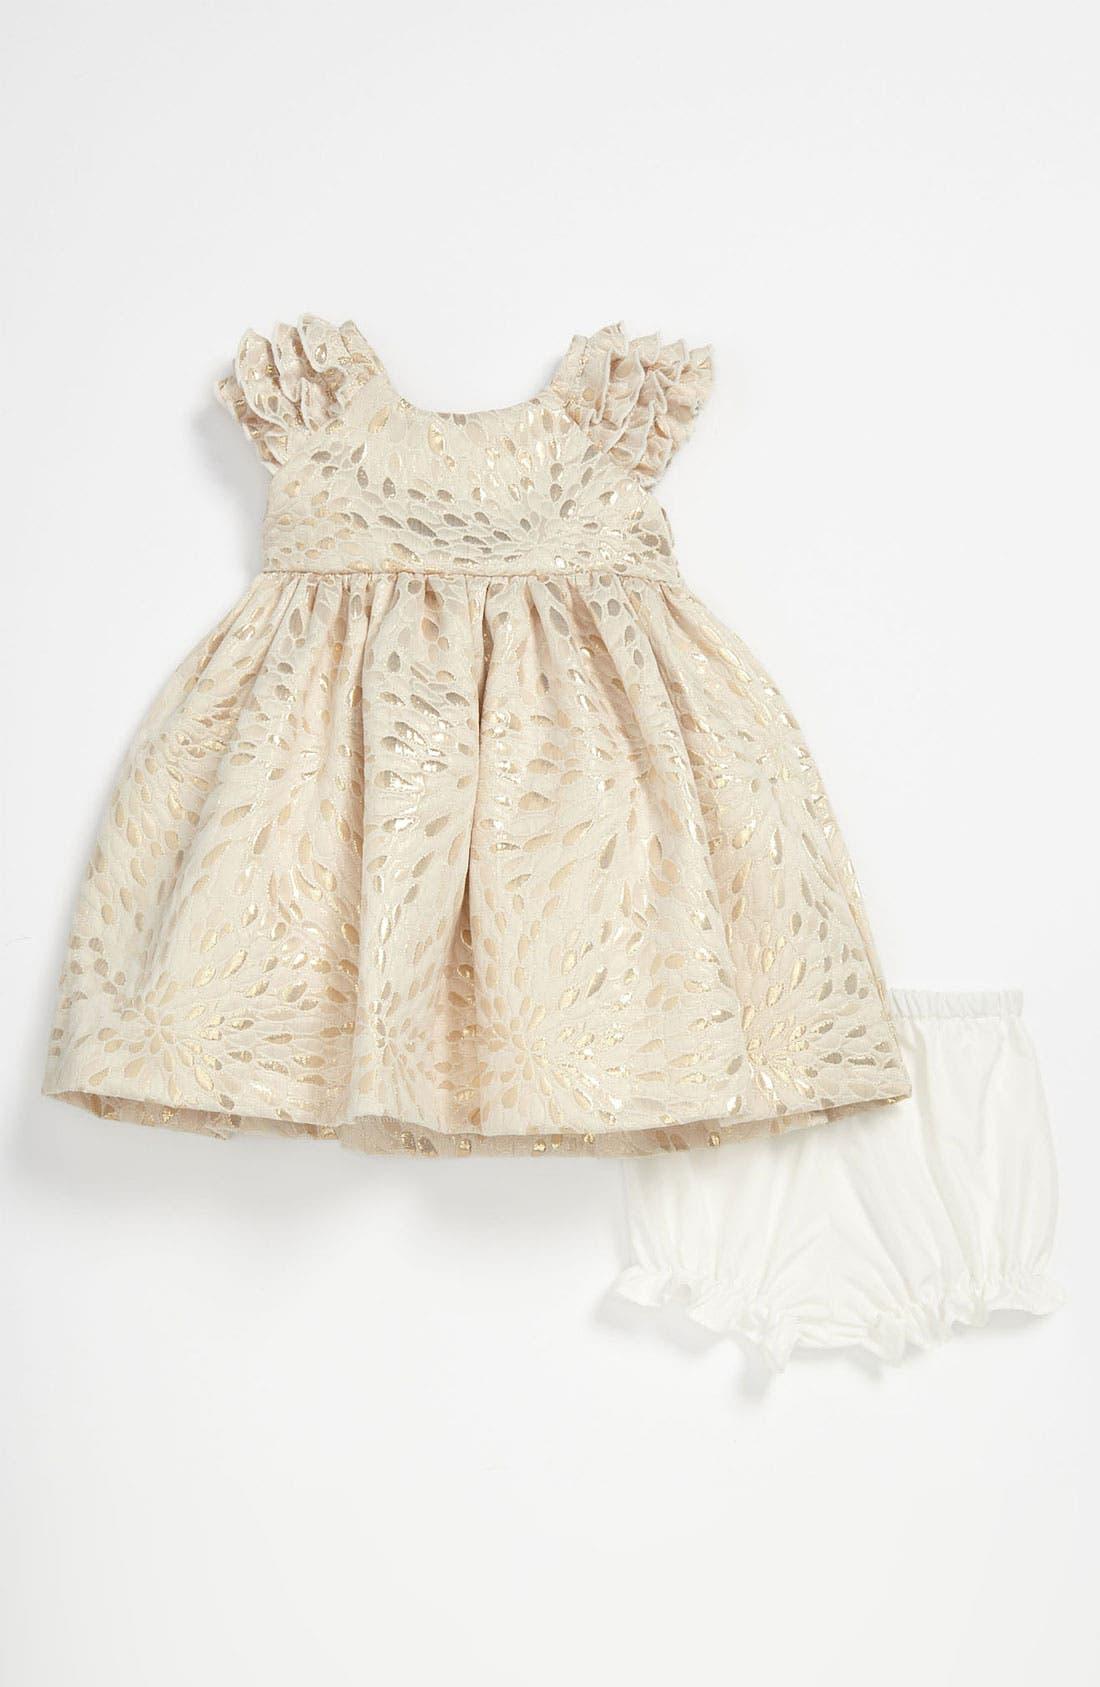 Main Image - Laura Ashley Brocade Dress & Bloomers (Infant)